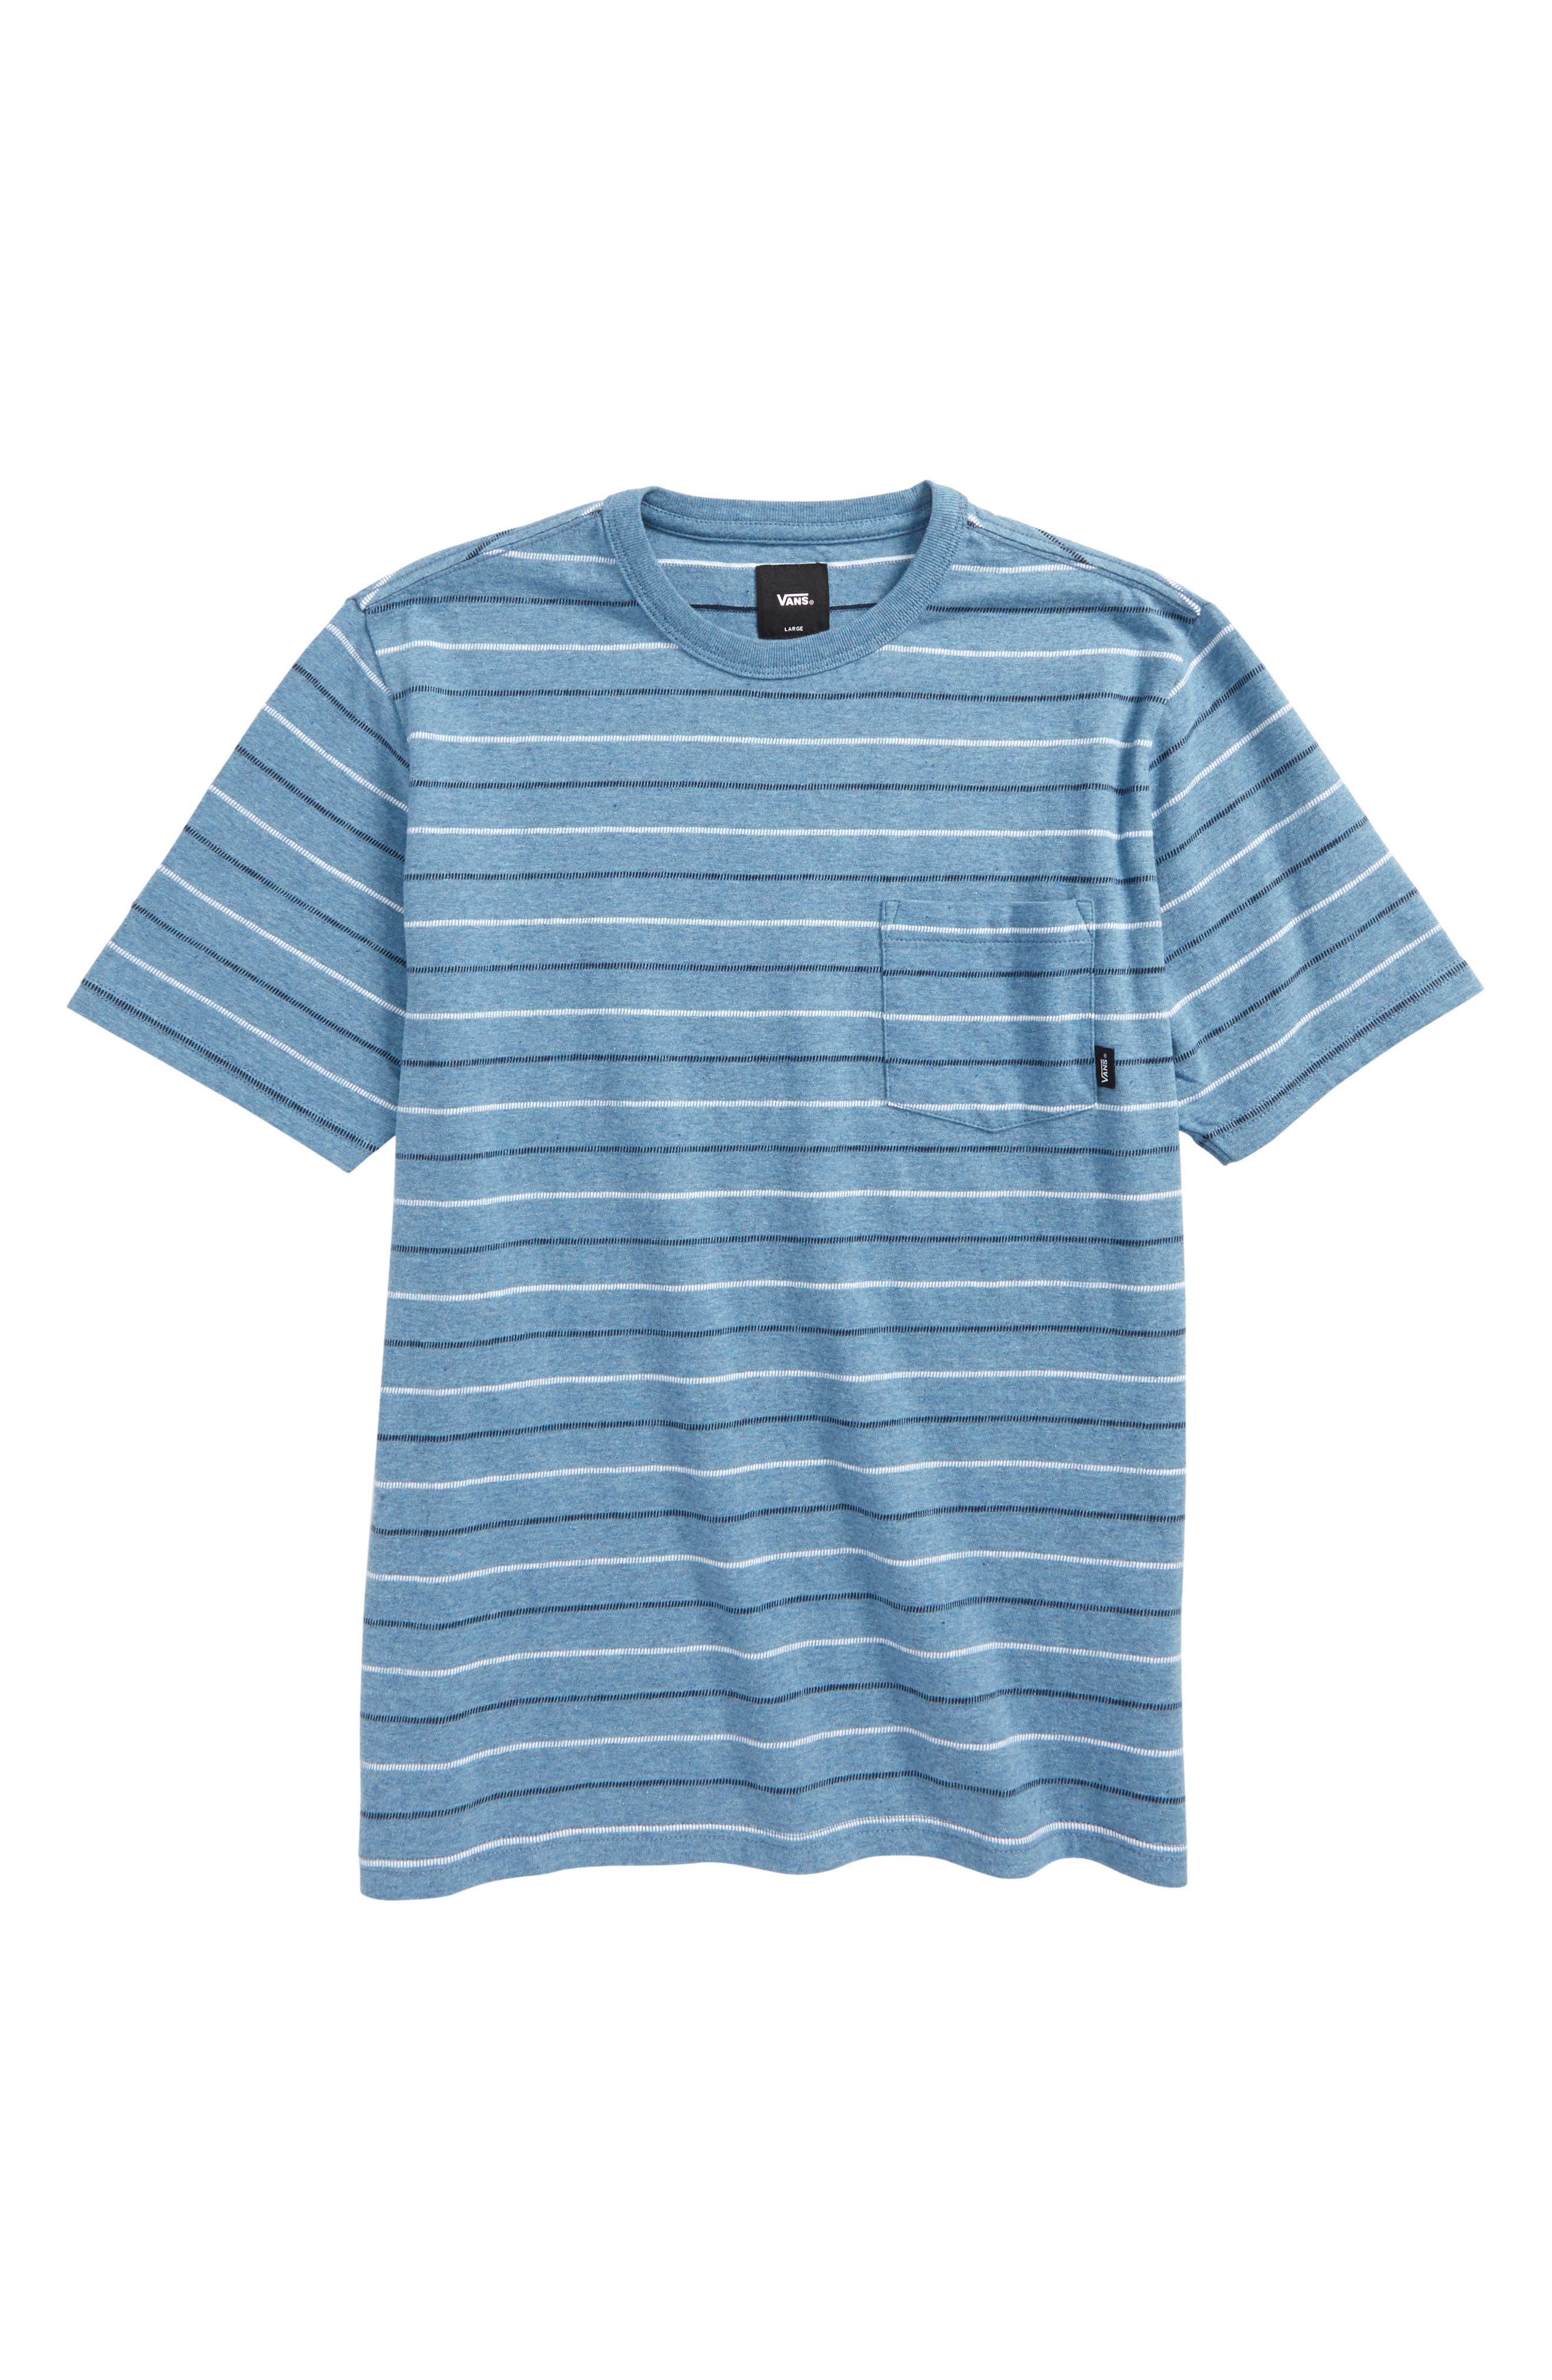 Strikemont III T-Shirt,                         Main,                         color, Copen Blue Heather